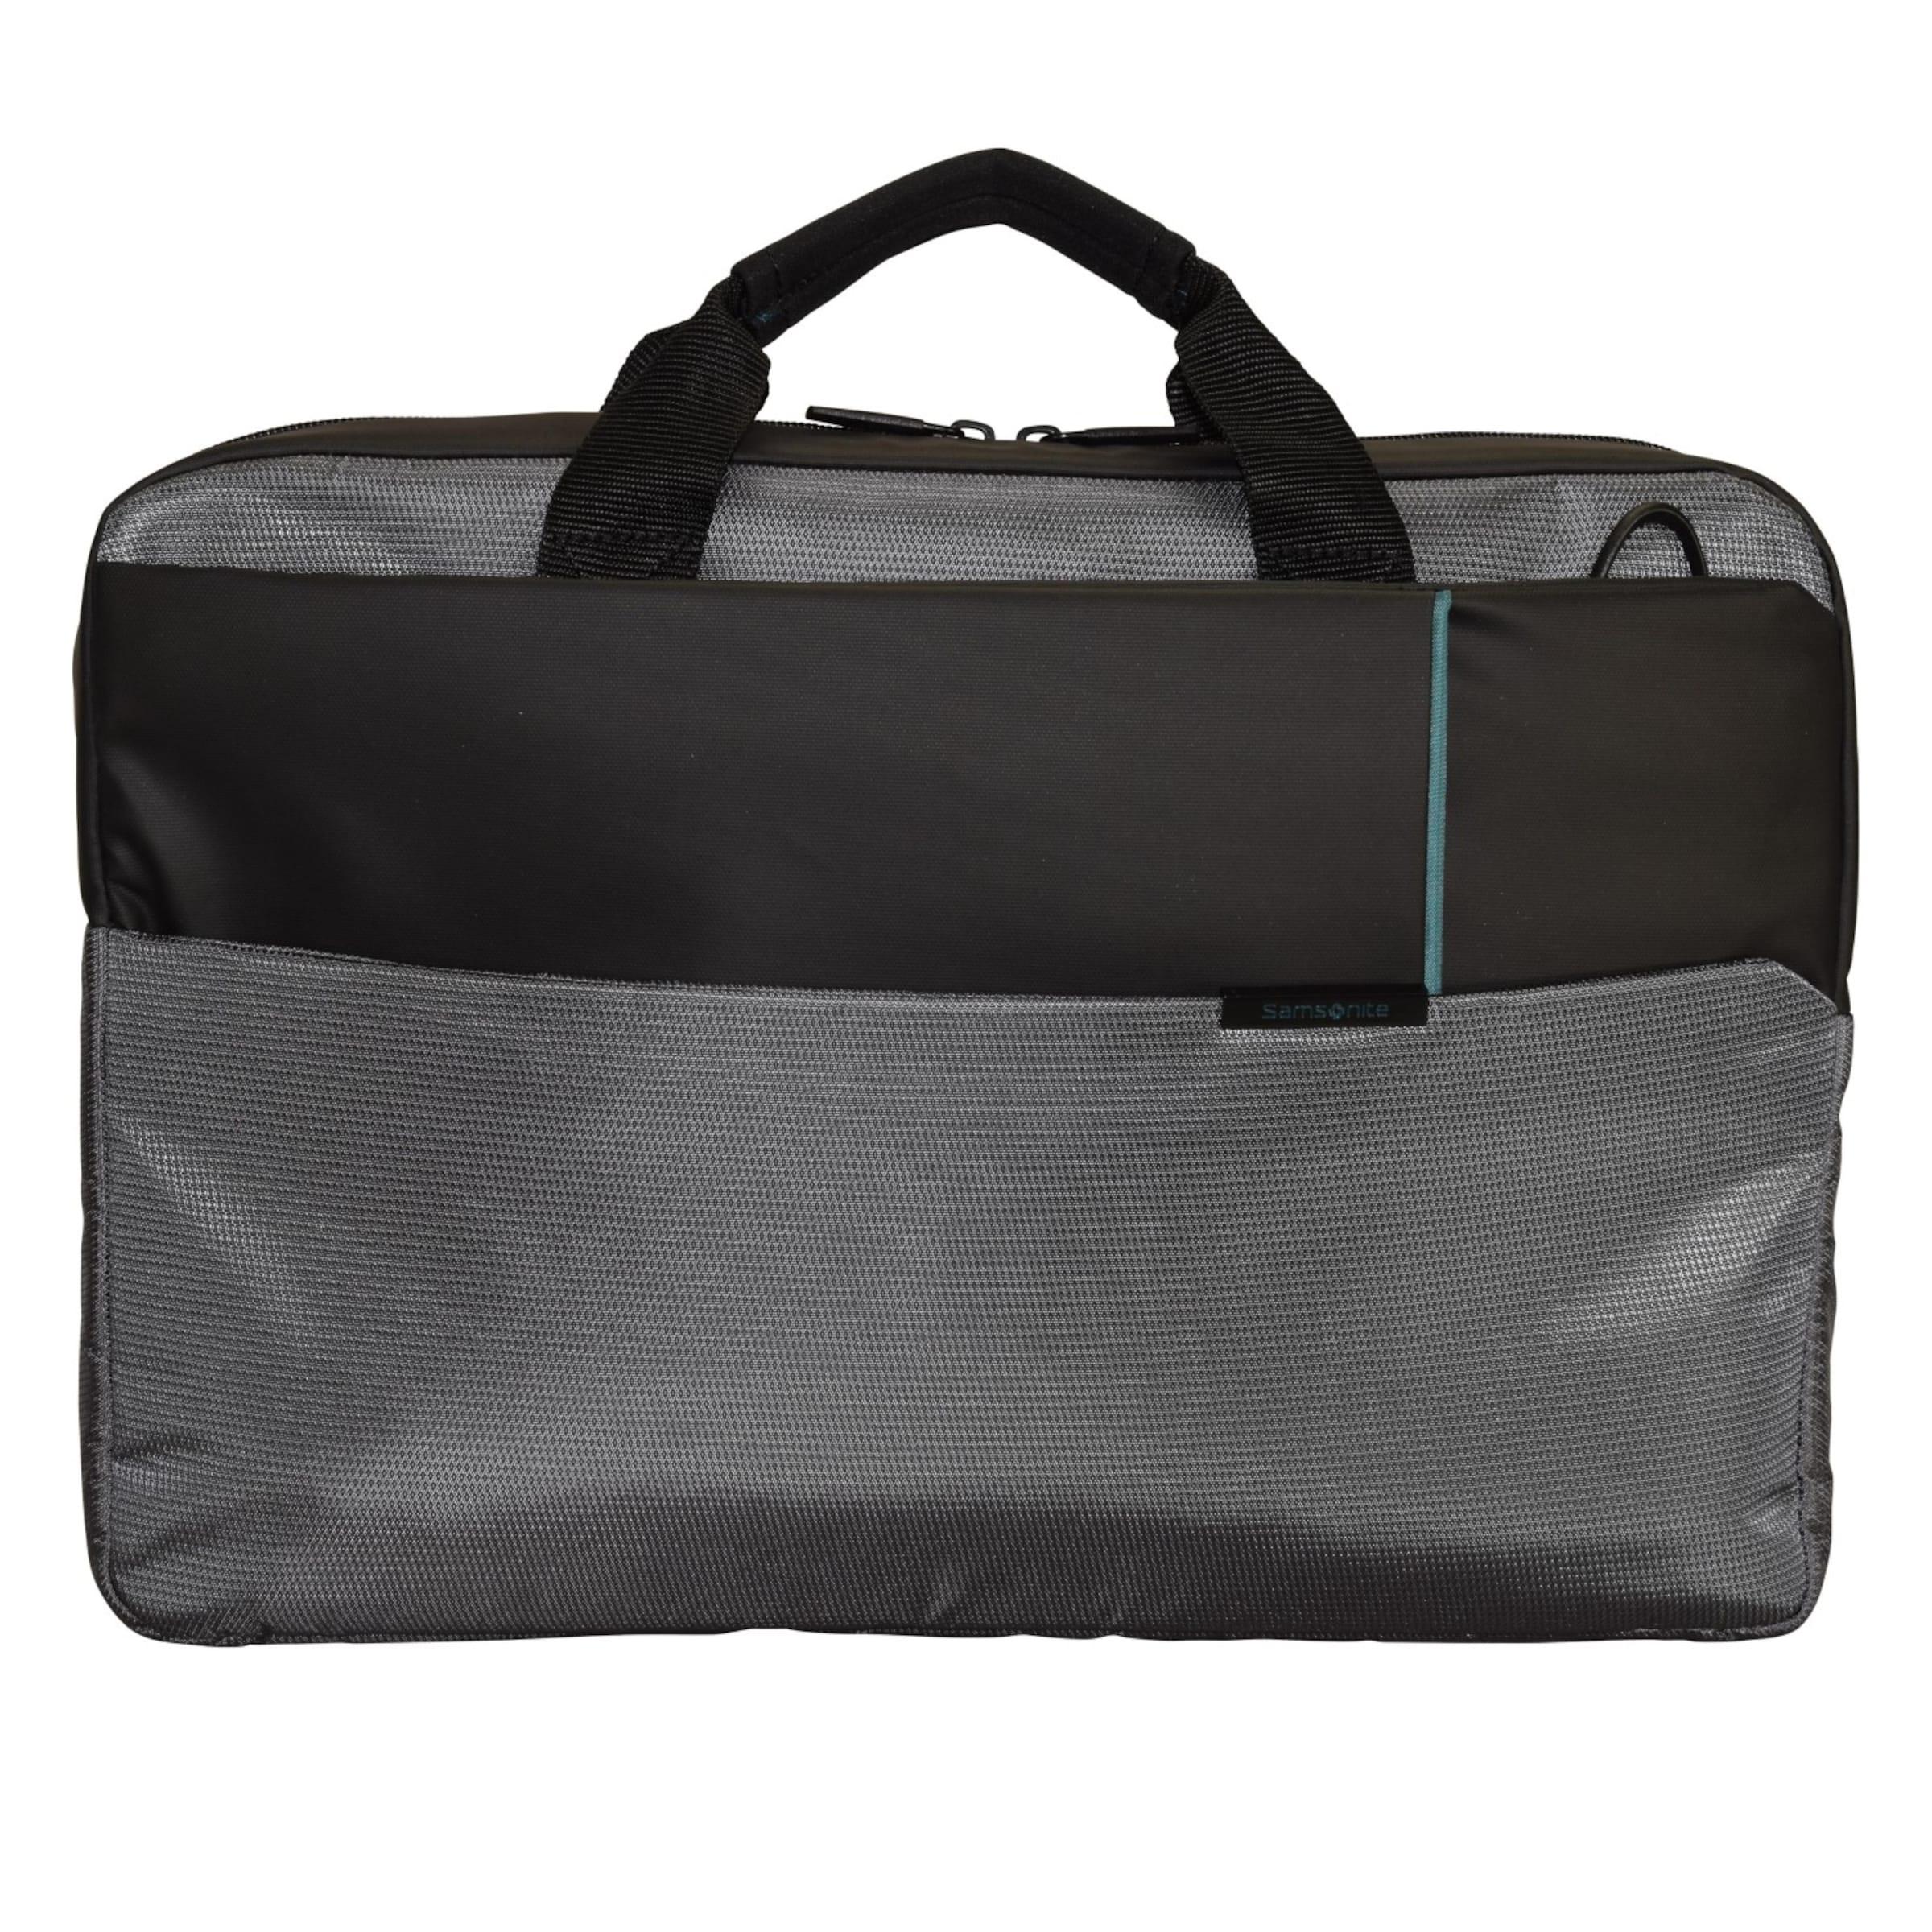 44 Businesstasche Laptopfach In Qibyte Cm AnthrazitSchwarz Samsonite yY67bgf